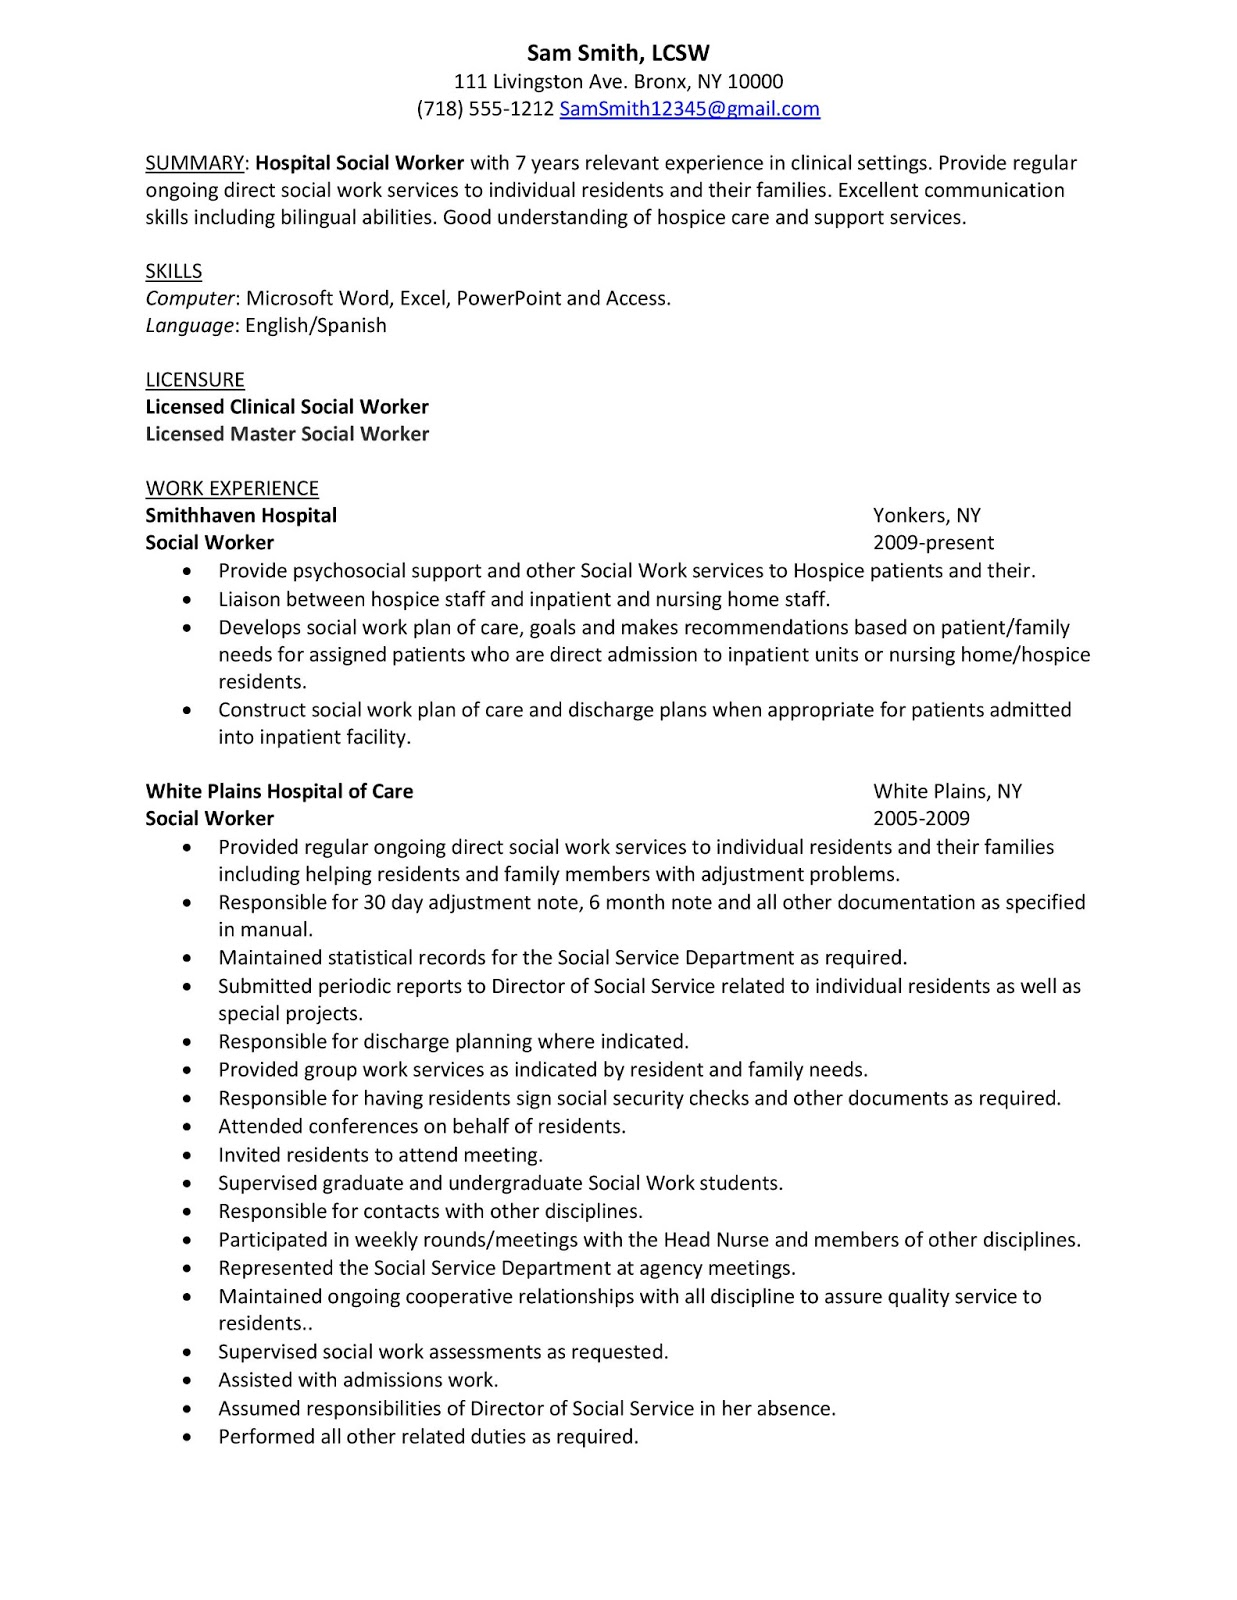 grad school resume resume grad school template graduate school grad school resume resume grad school template graduate school - Grad School Resume Objective